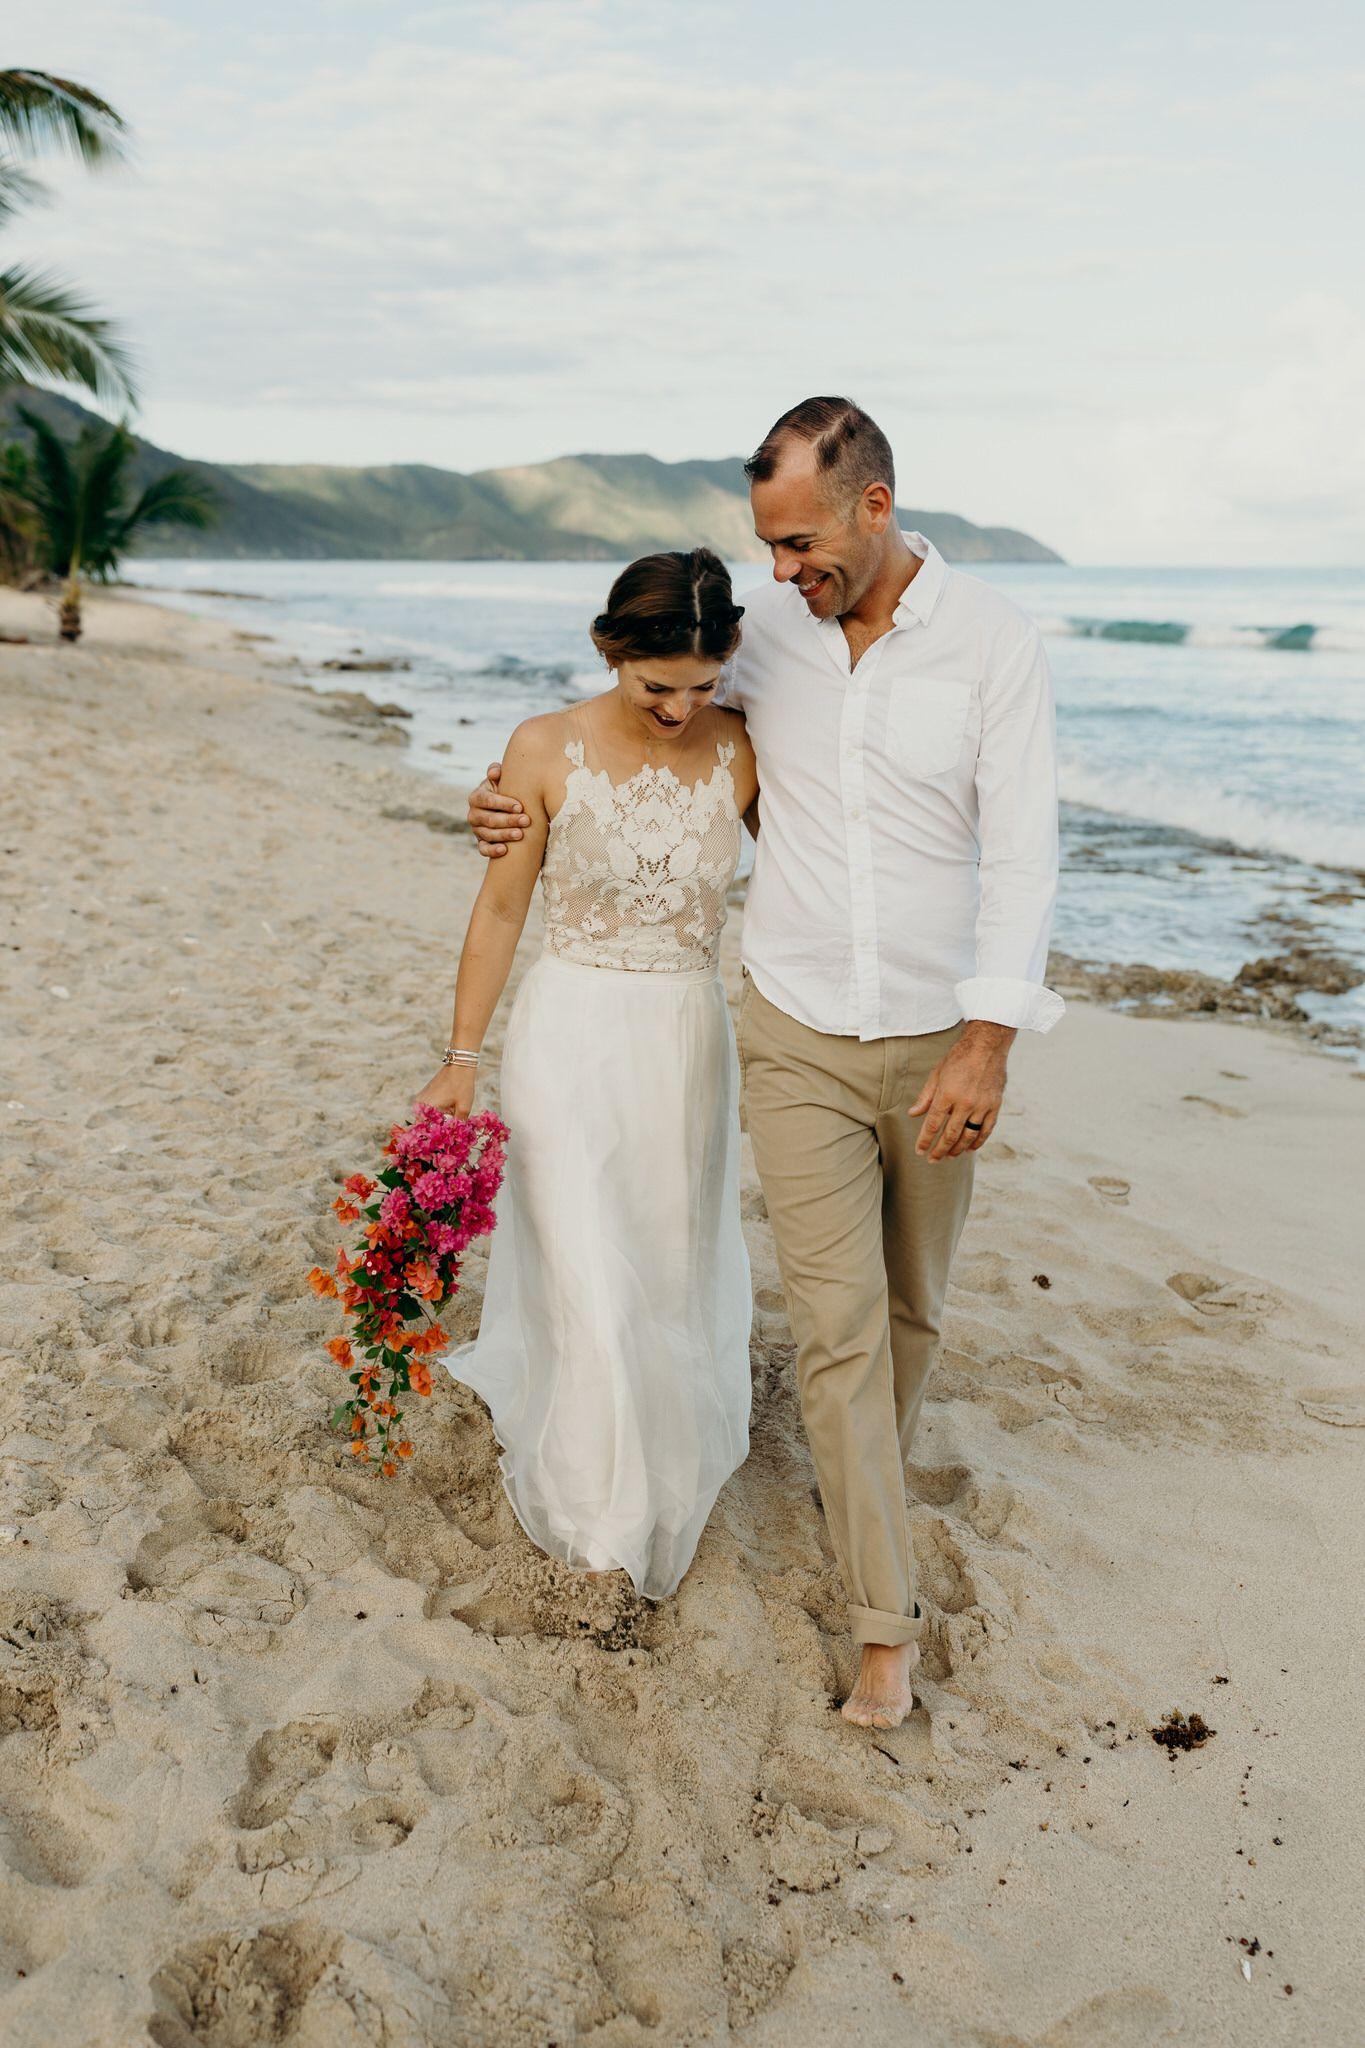 Pin on Virgin Islands Weddings & Elopements